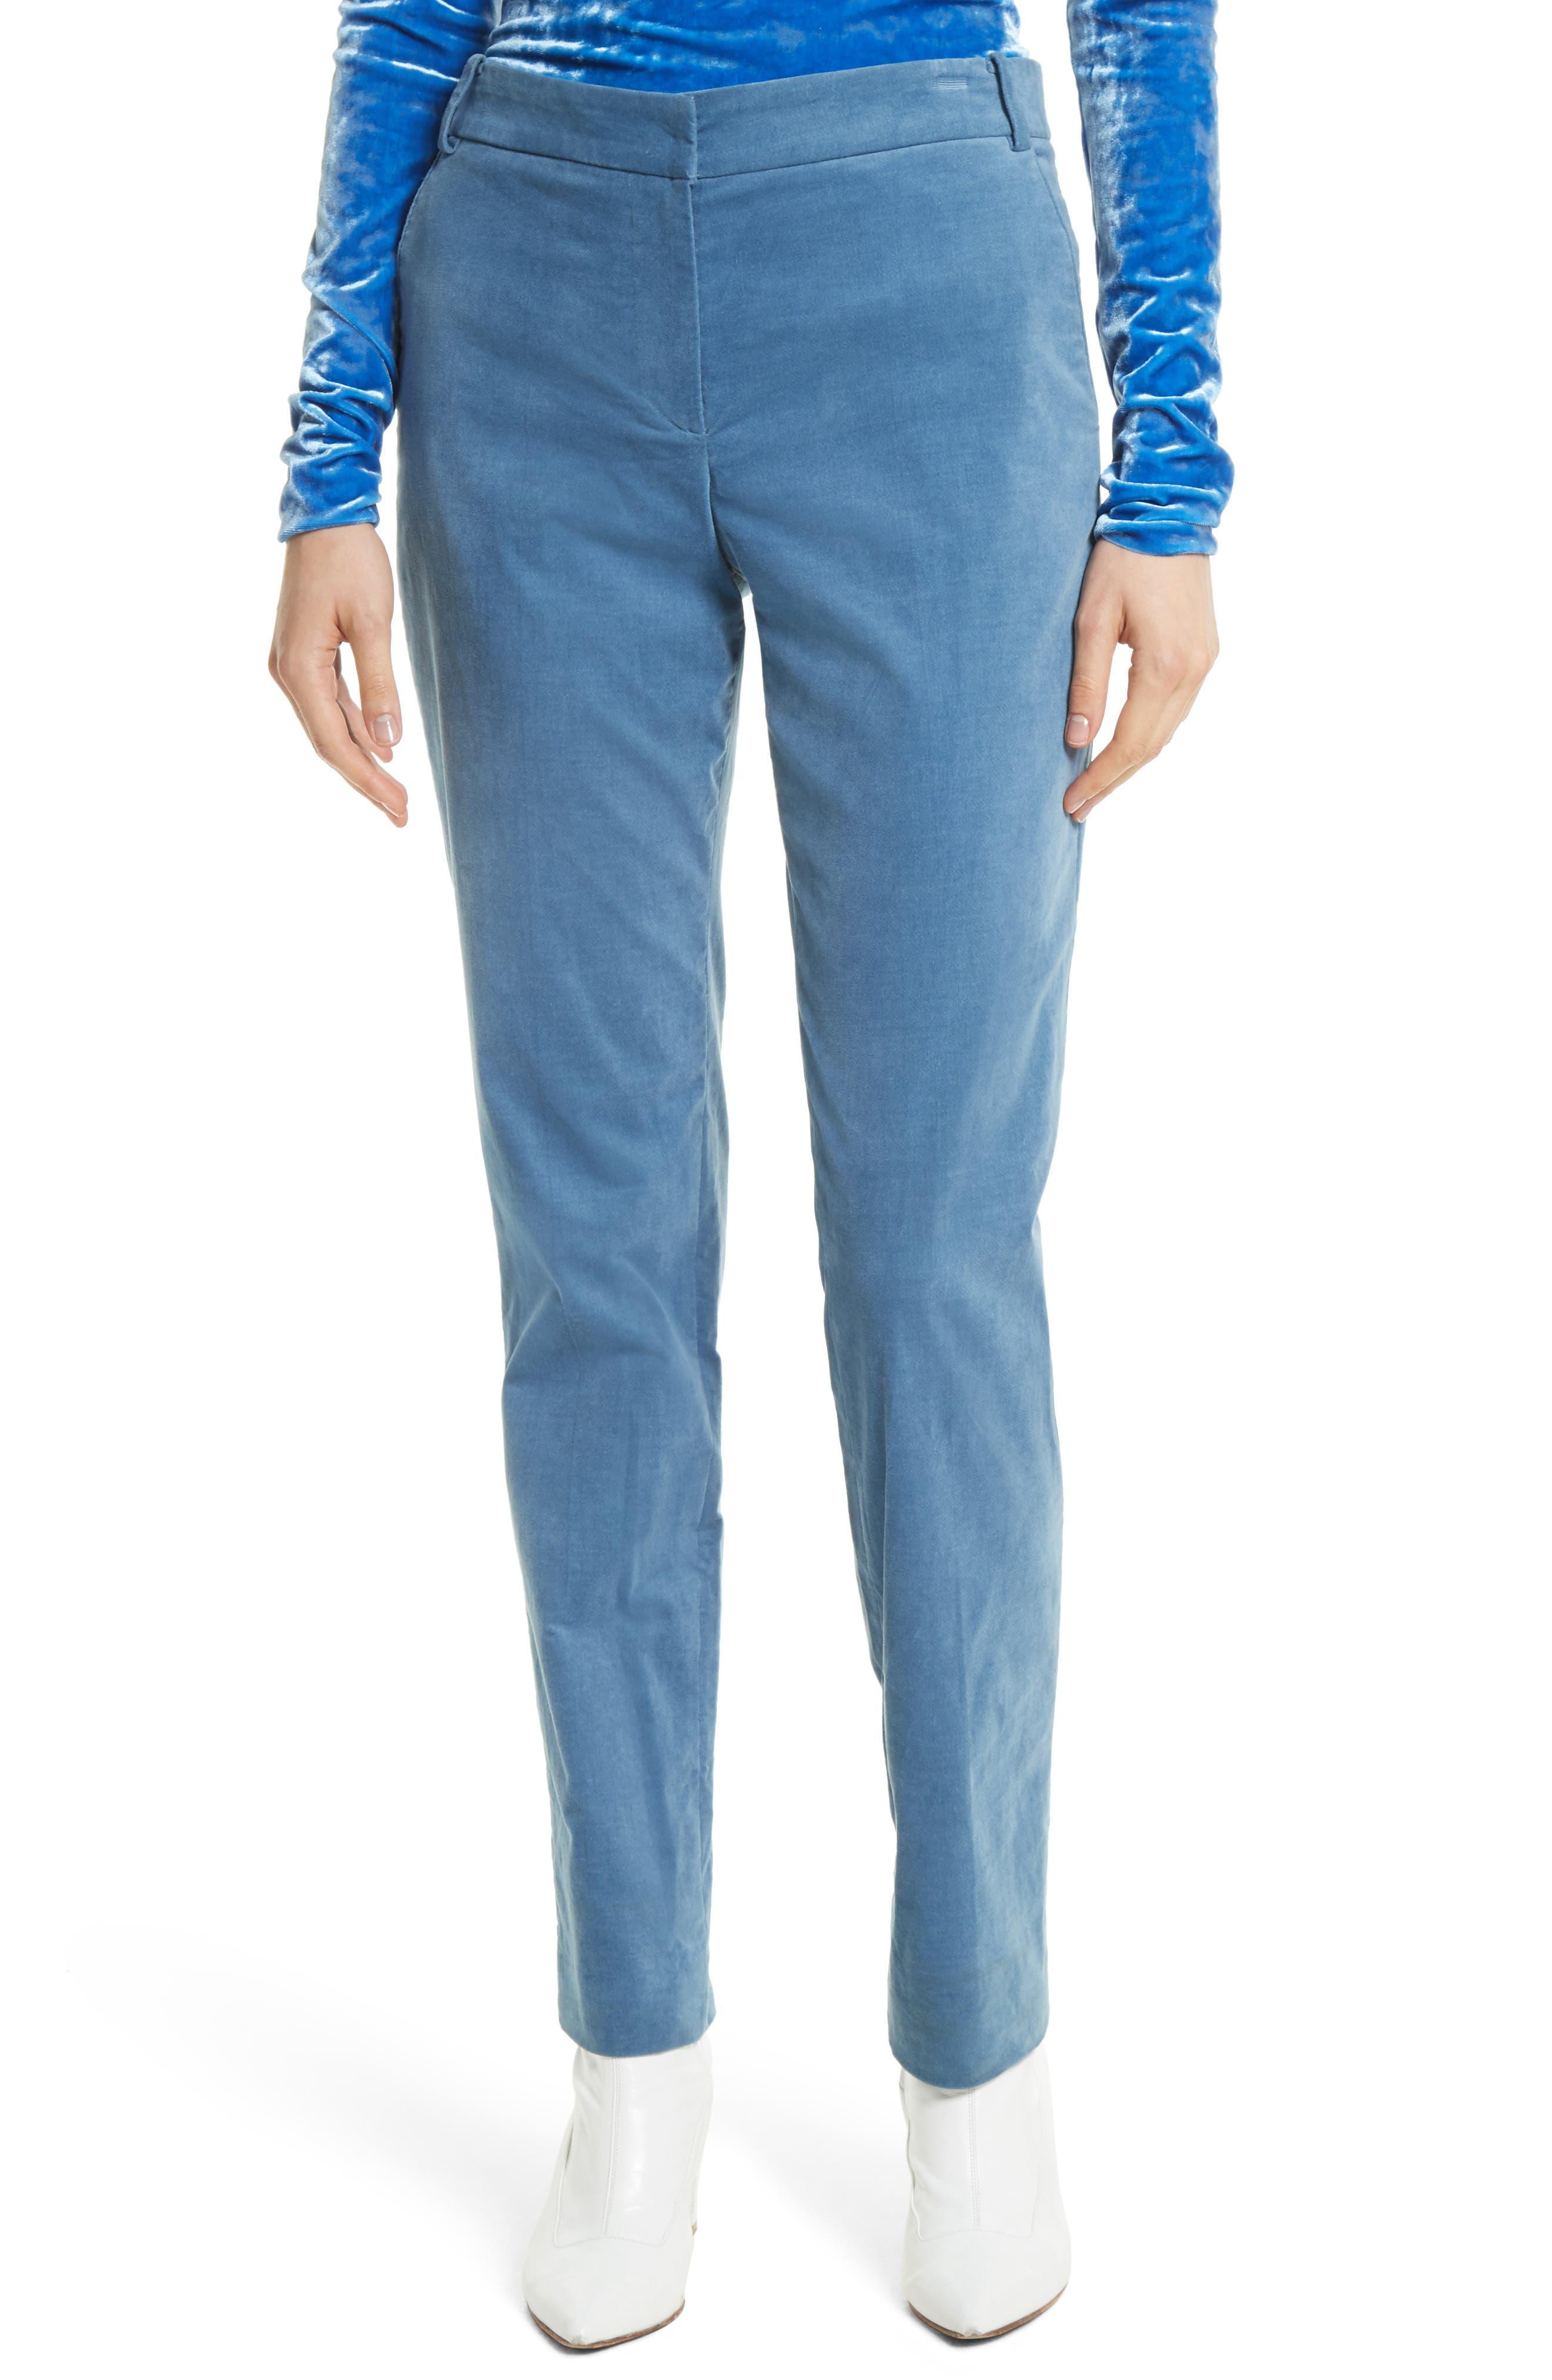 Tibi Moleskin Stretch Cotton Skinny Pants